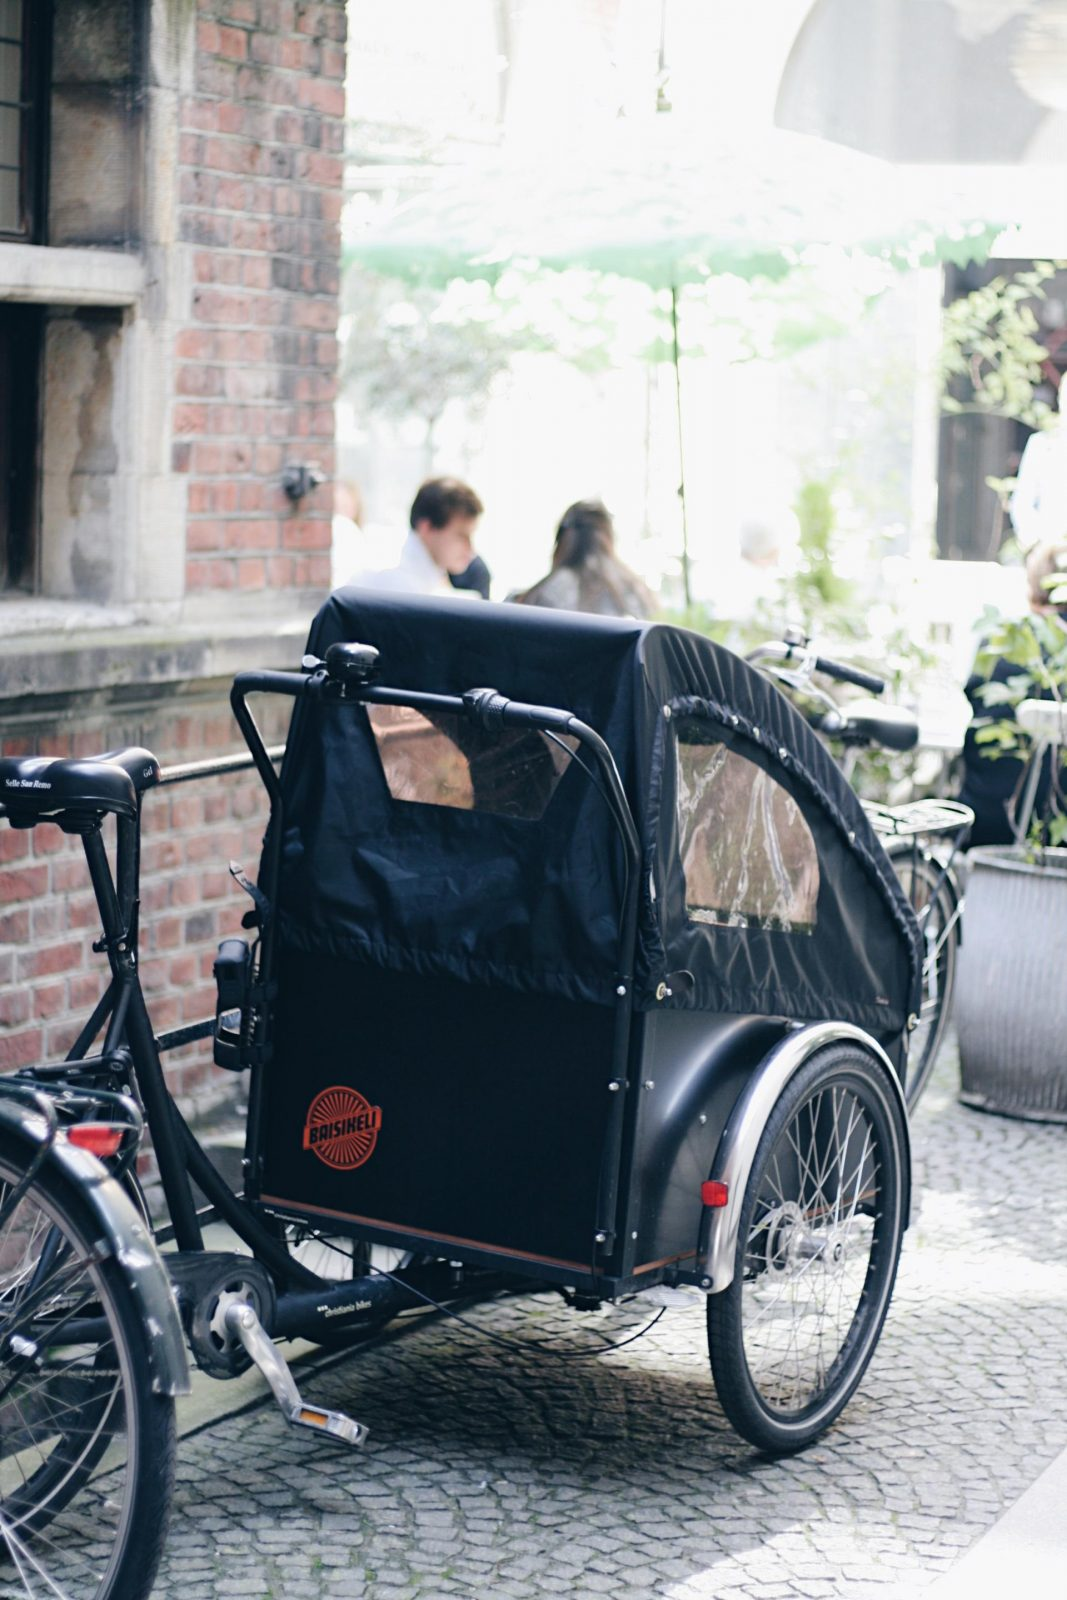 Familienausflug Kopenhagen Christiania Fahrrad | Pinspiration